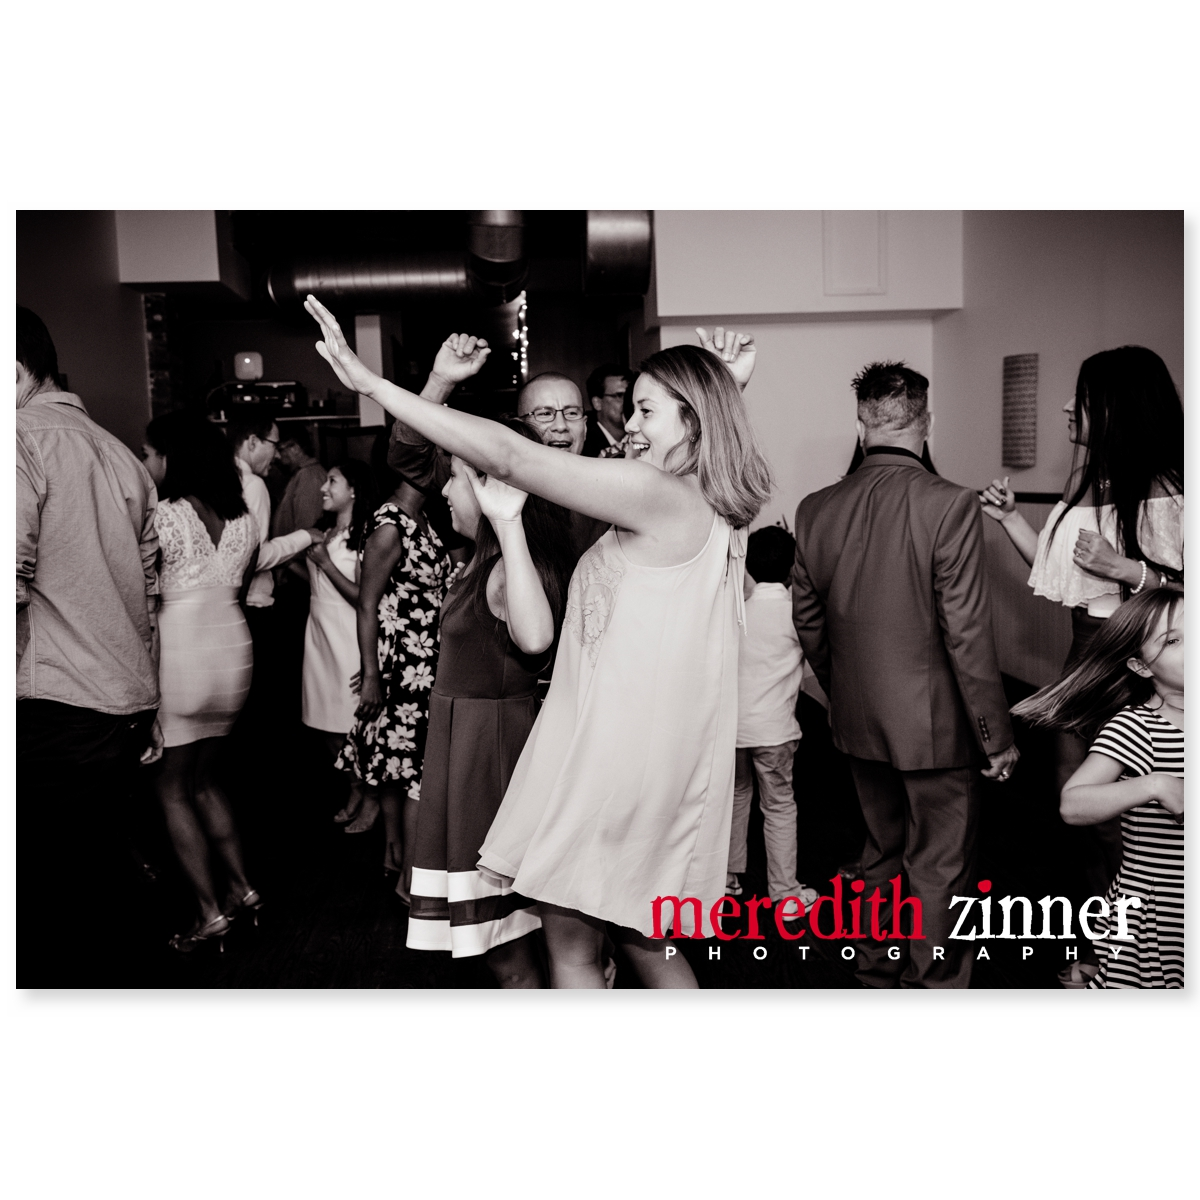 Meredith_Zinner_Photography_StilesCelebration_0363